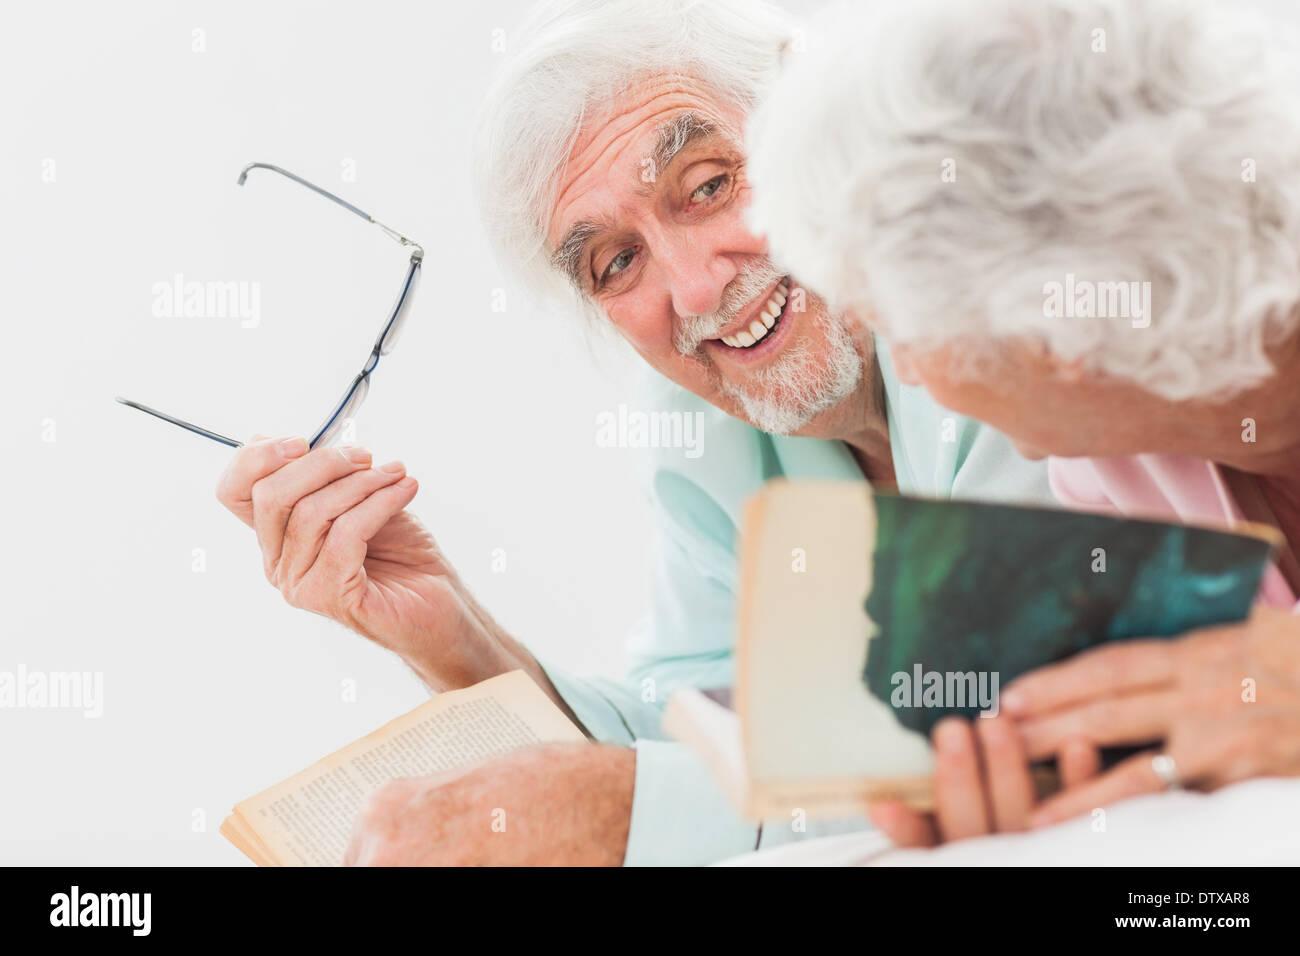 Mann lächelte Frau im Bett Stockfoto, Bild: 66962092 - Alamy